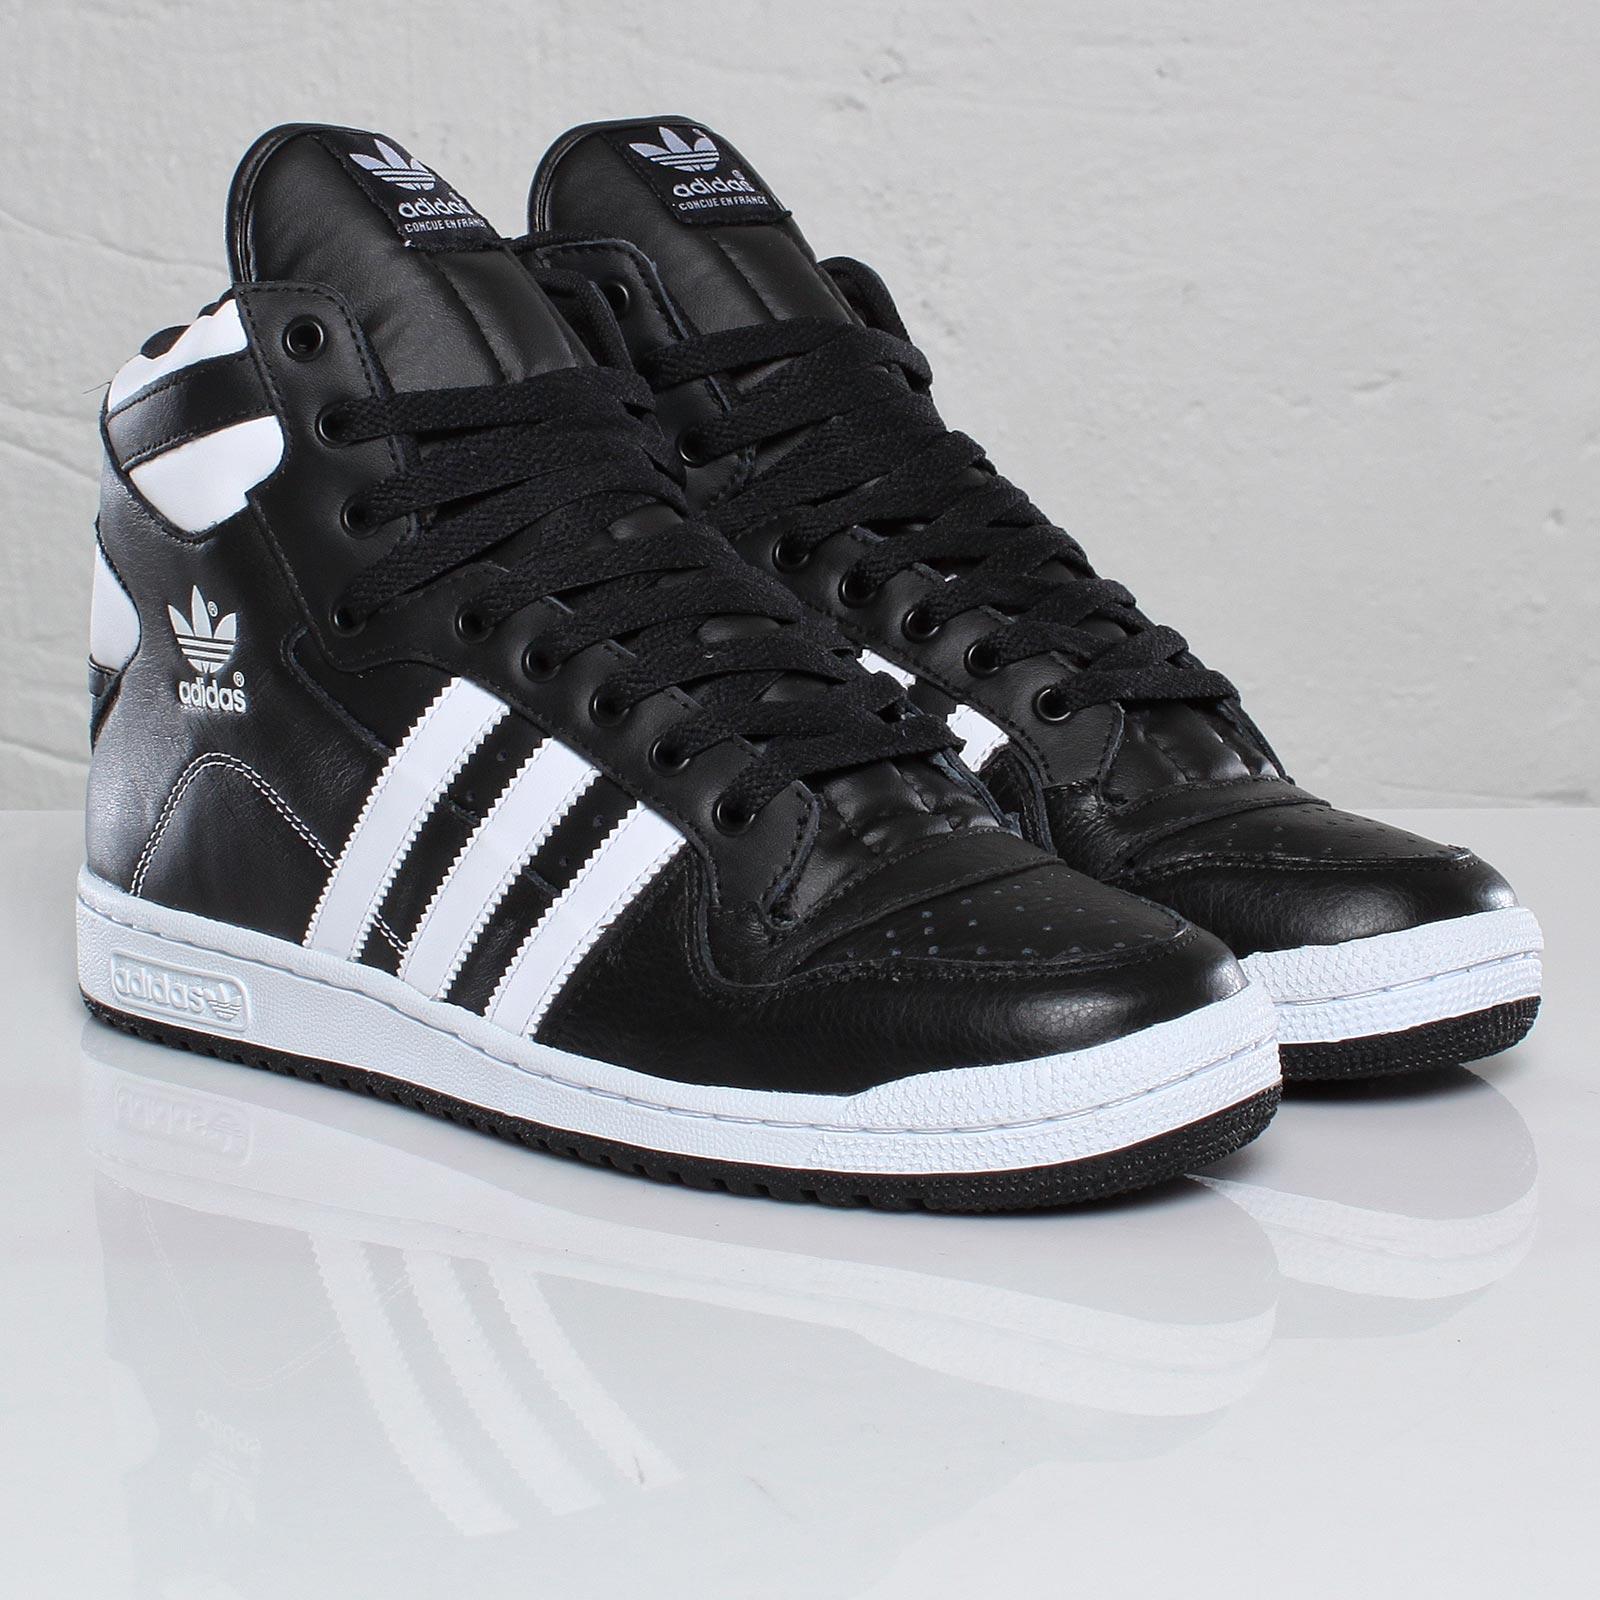 wholesale dealer b7f10 41b45 adidas Decade OG Mid chaussures blanc rouge bleu